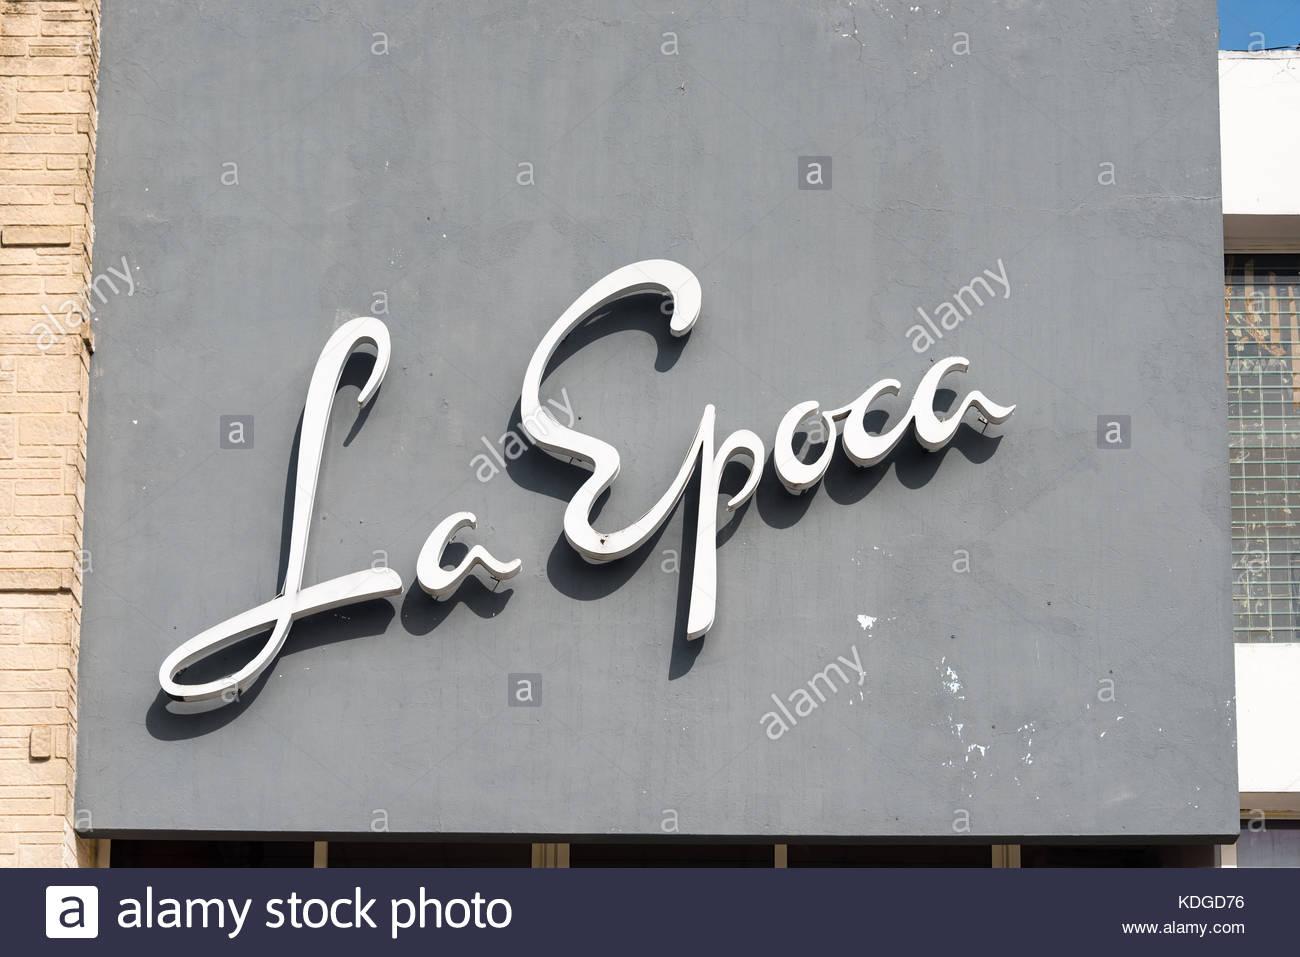 Lettering On Metal La Epoca Signboard Stylised White Metal Lettering On Dark Grey